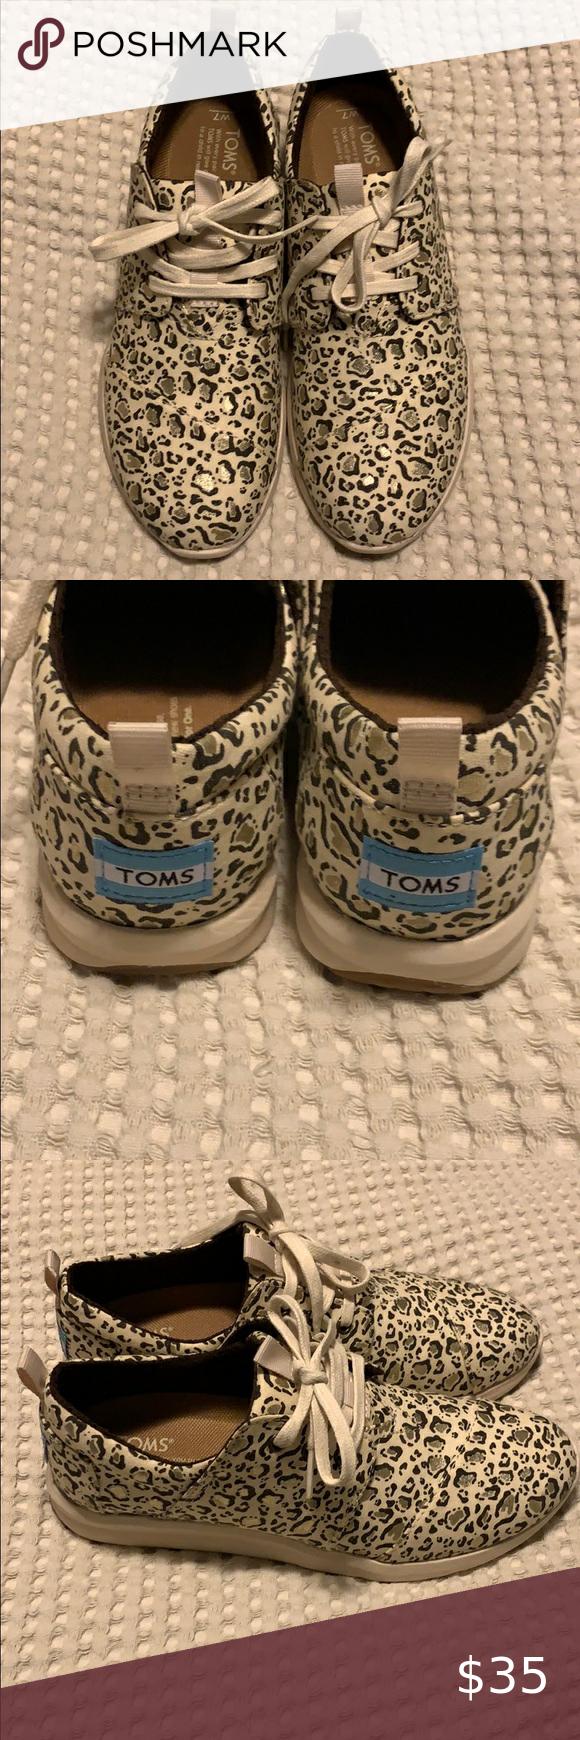 TOMS cheetah print tennis shoes! in 2020 Cheap toms